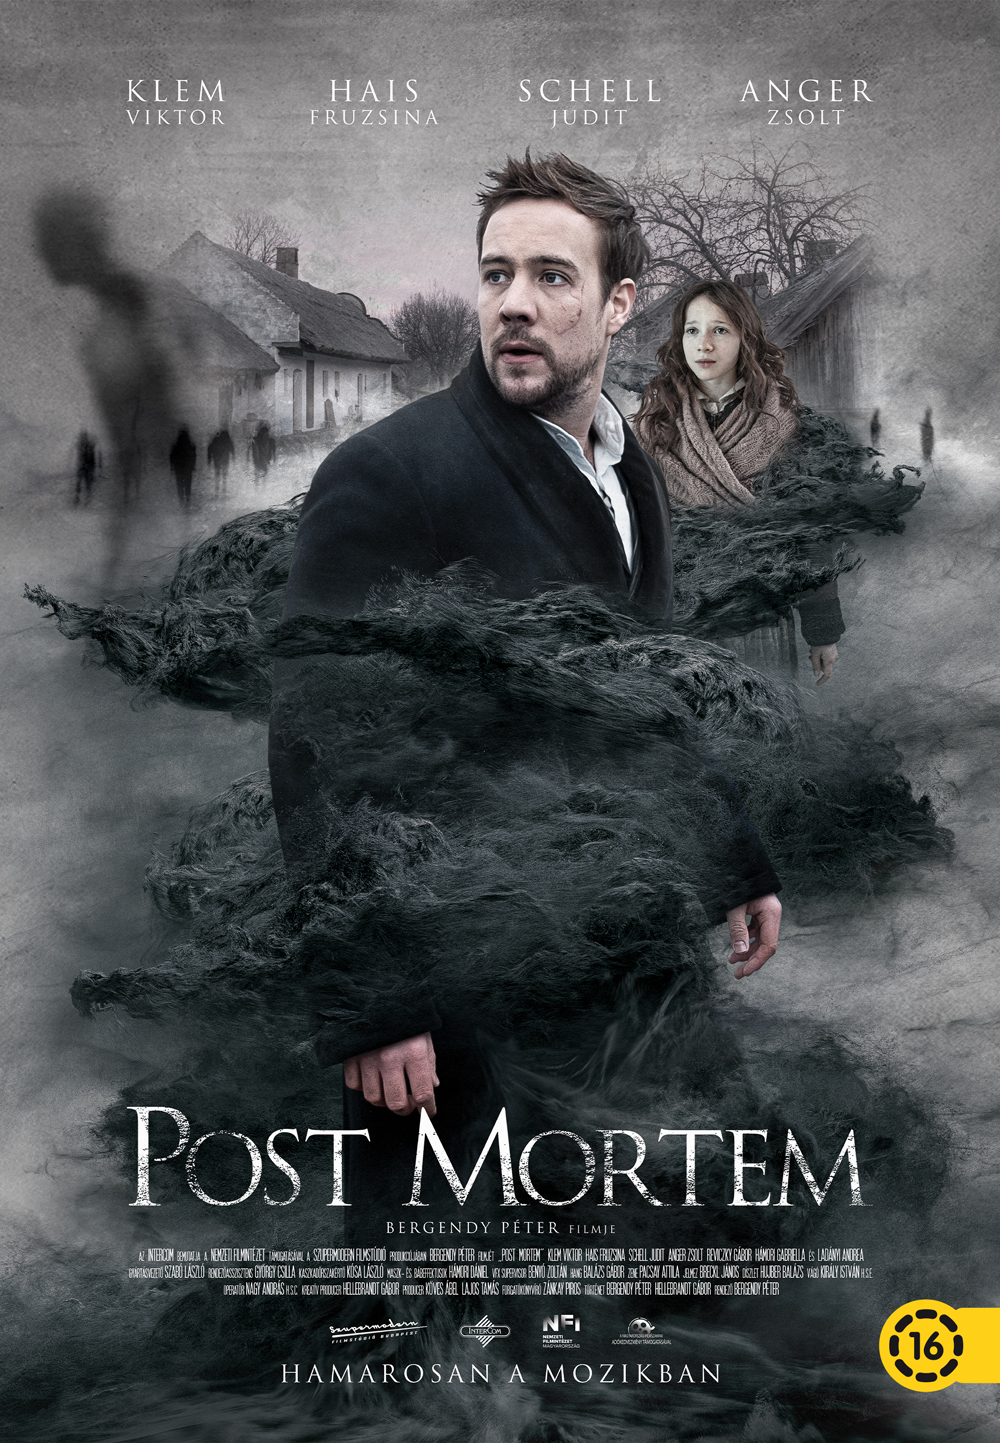 Post Mortem magyar film plakátja